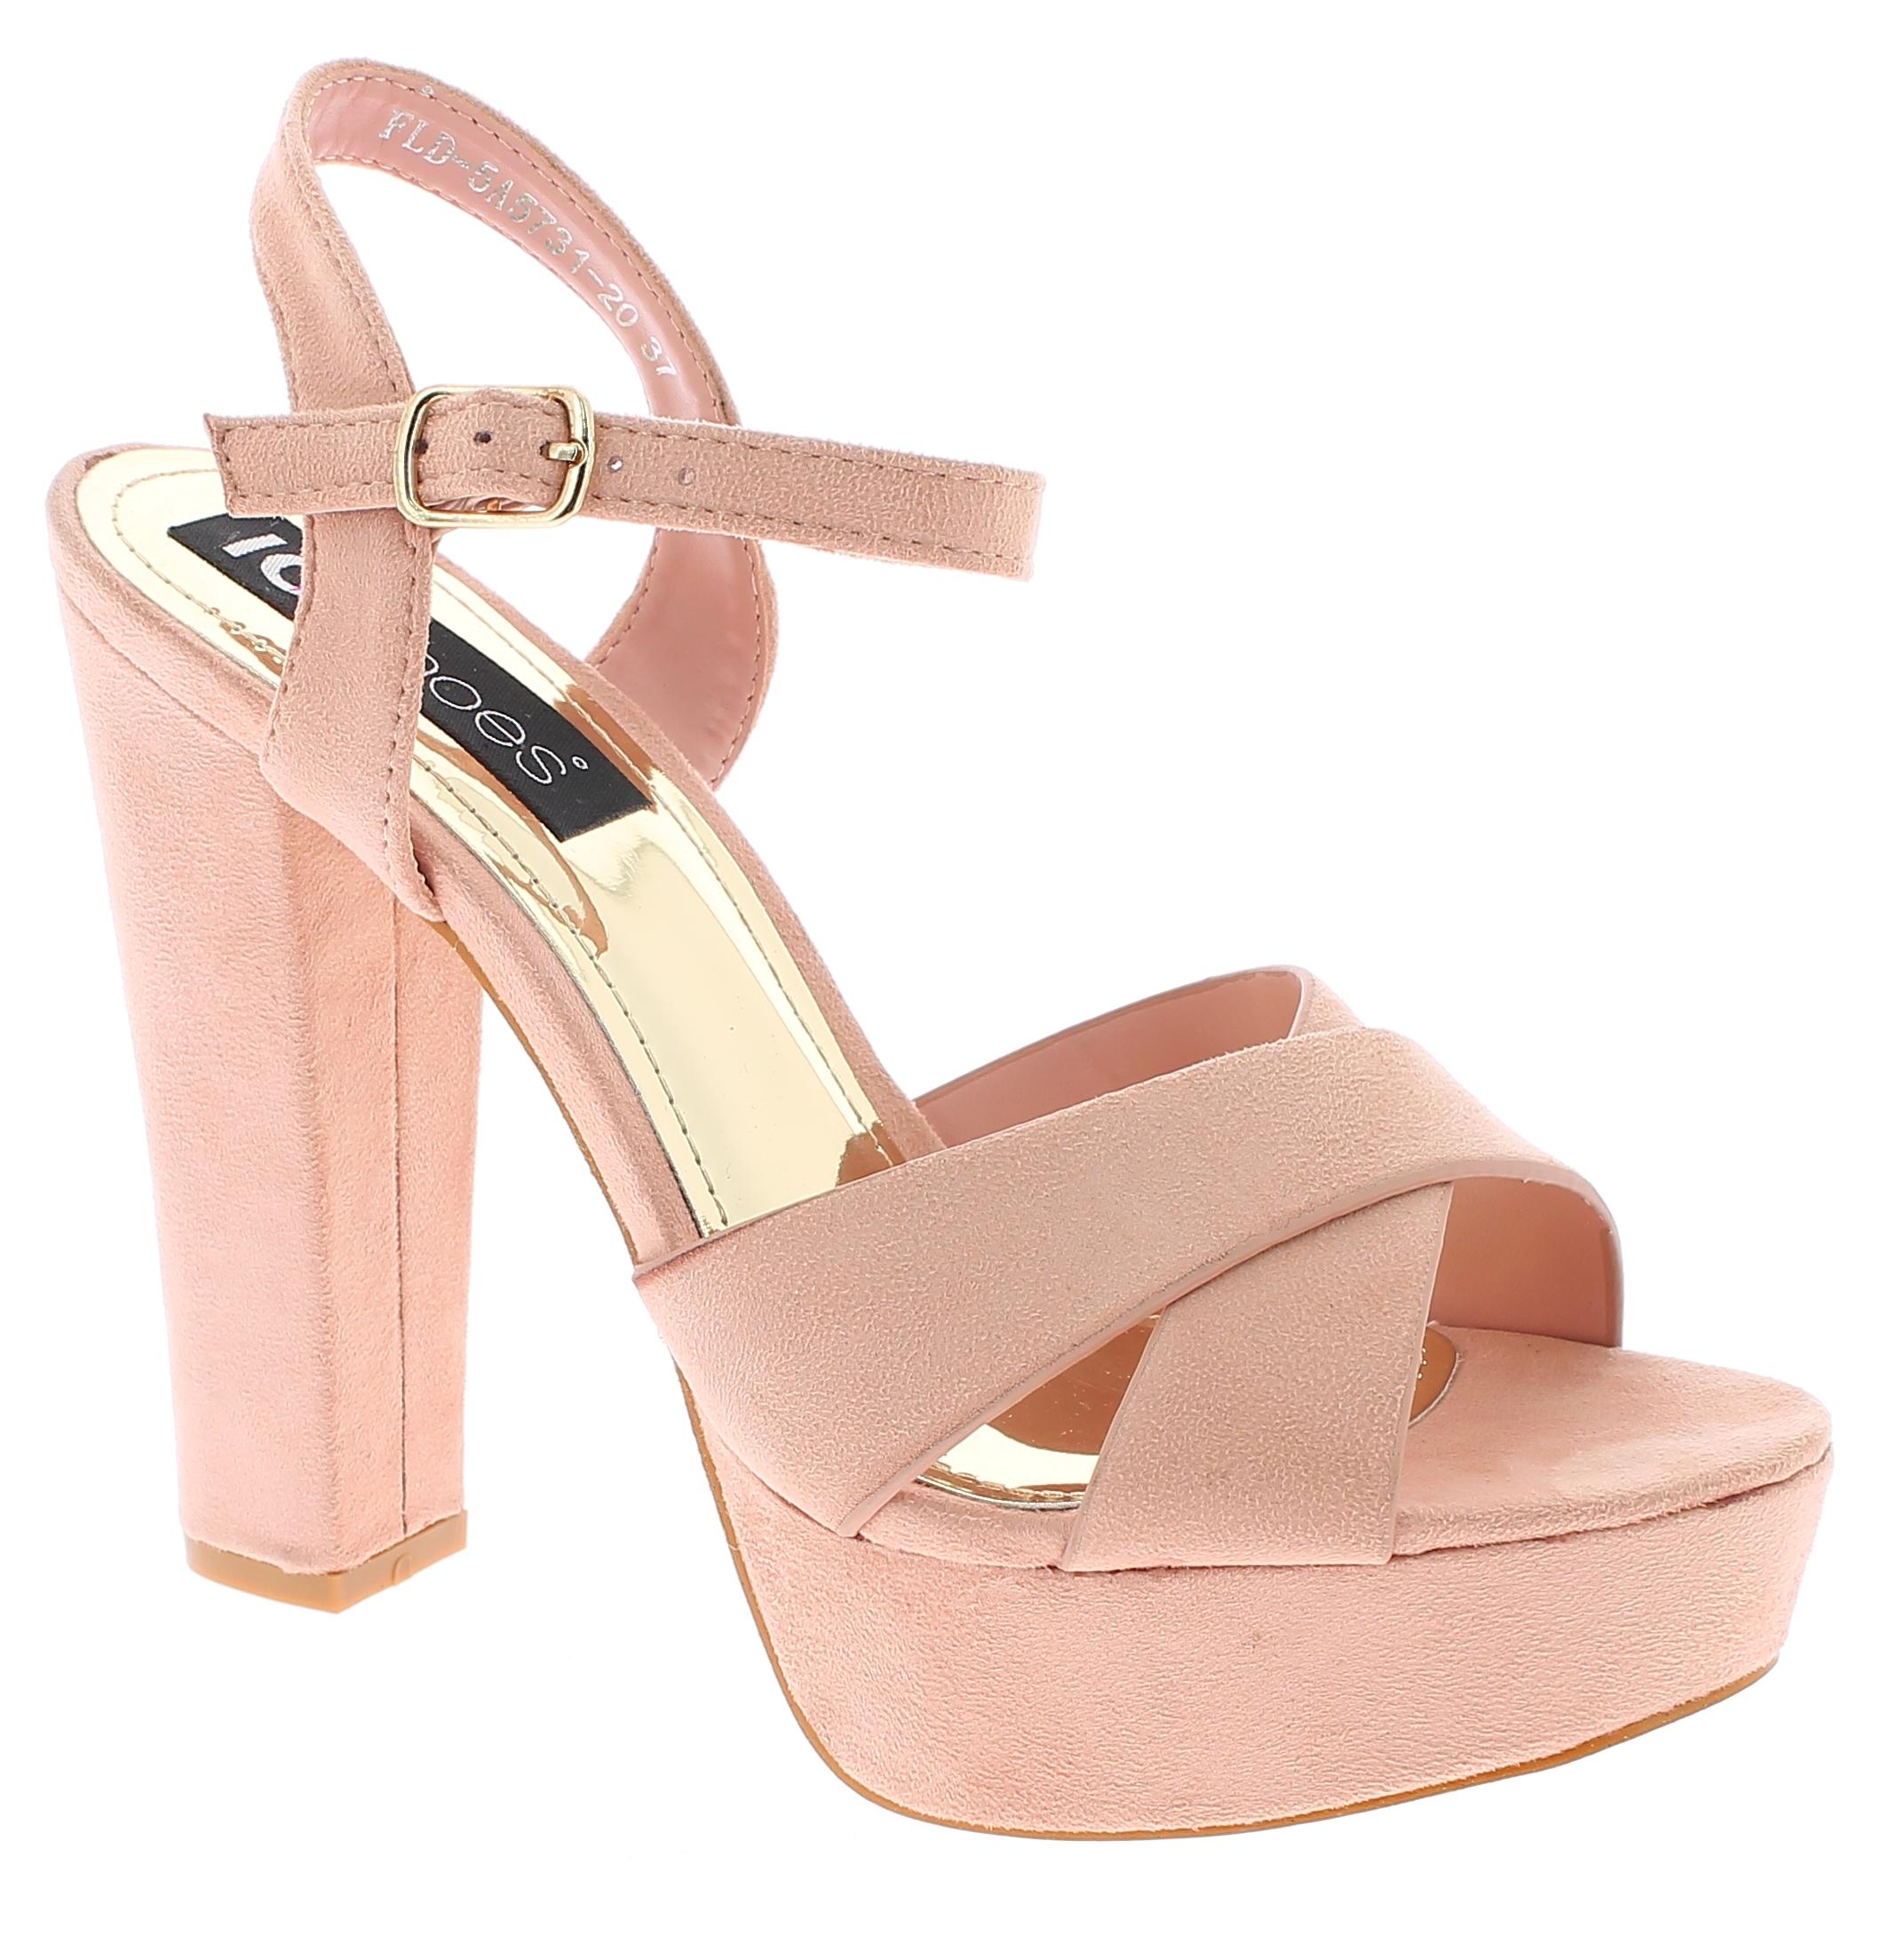 IQSHOES Γυναικείο Πέδιλο 5A5731 Ροζ - IqShoes - 5A5731 PINK-pink-36/1/11/7 παπούτσια  πέδιλα